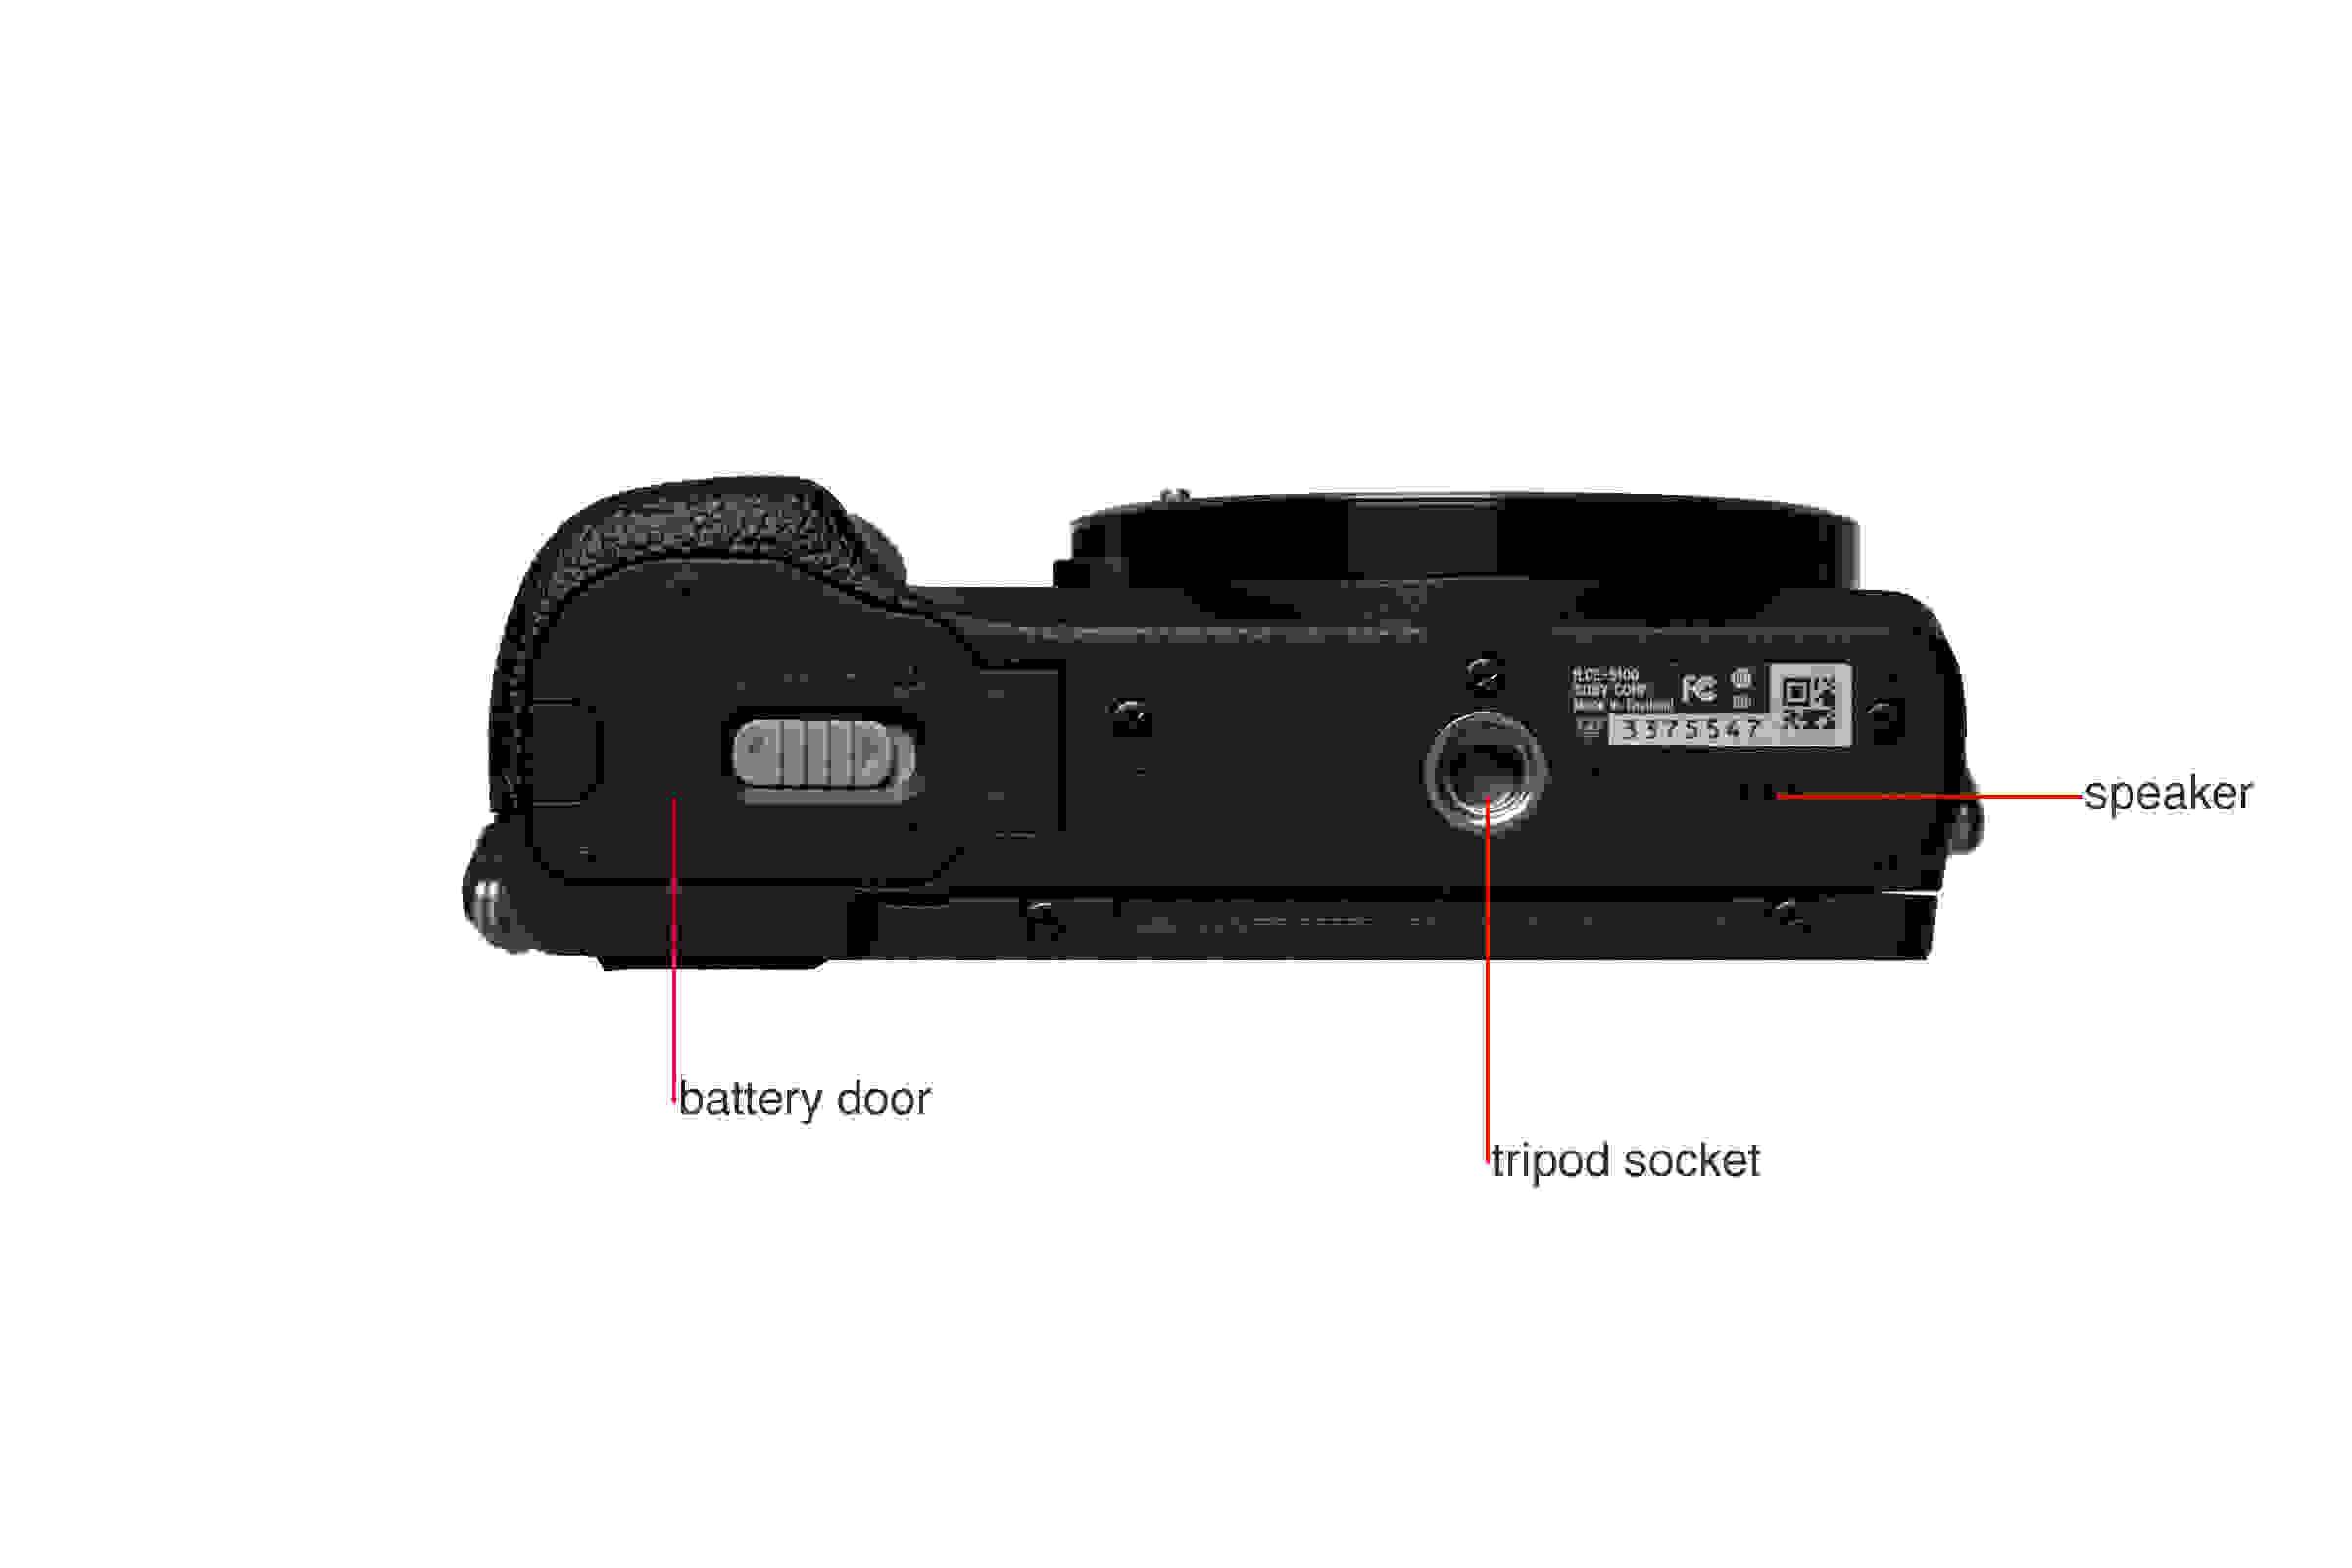 A5100 camera bottom